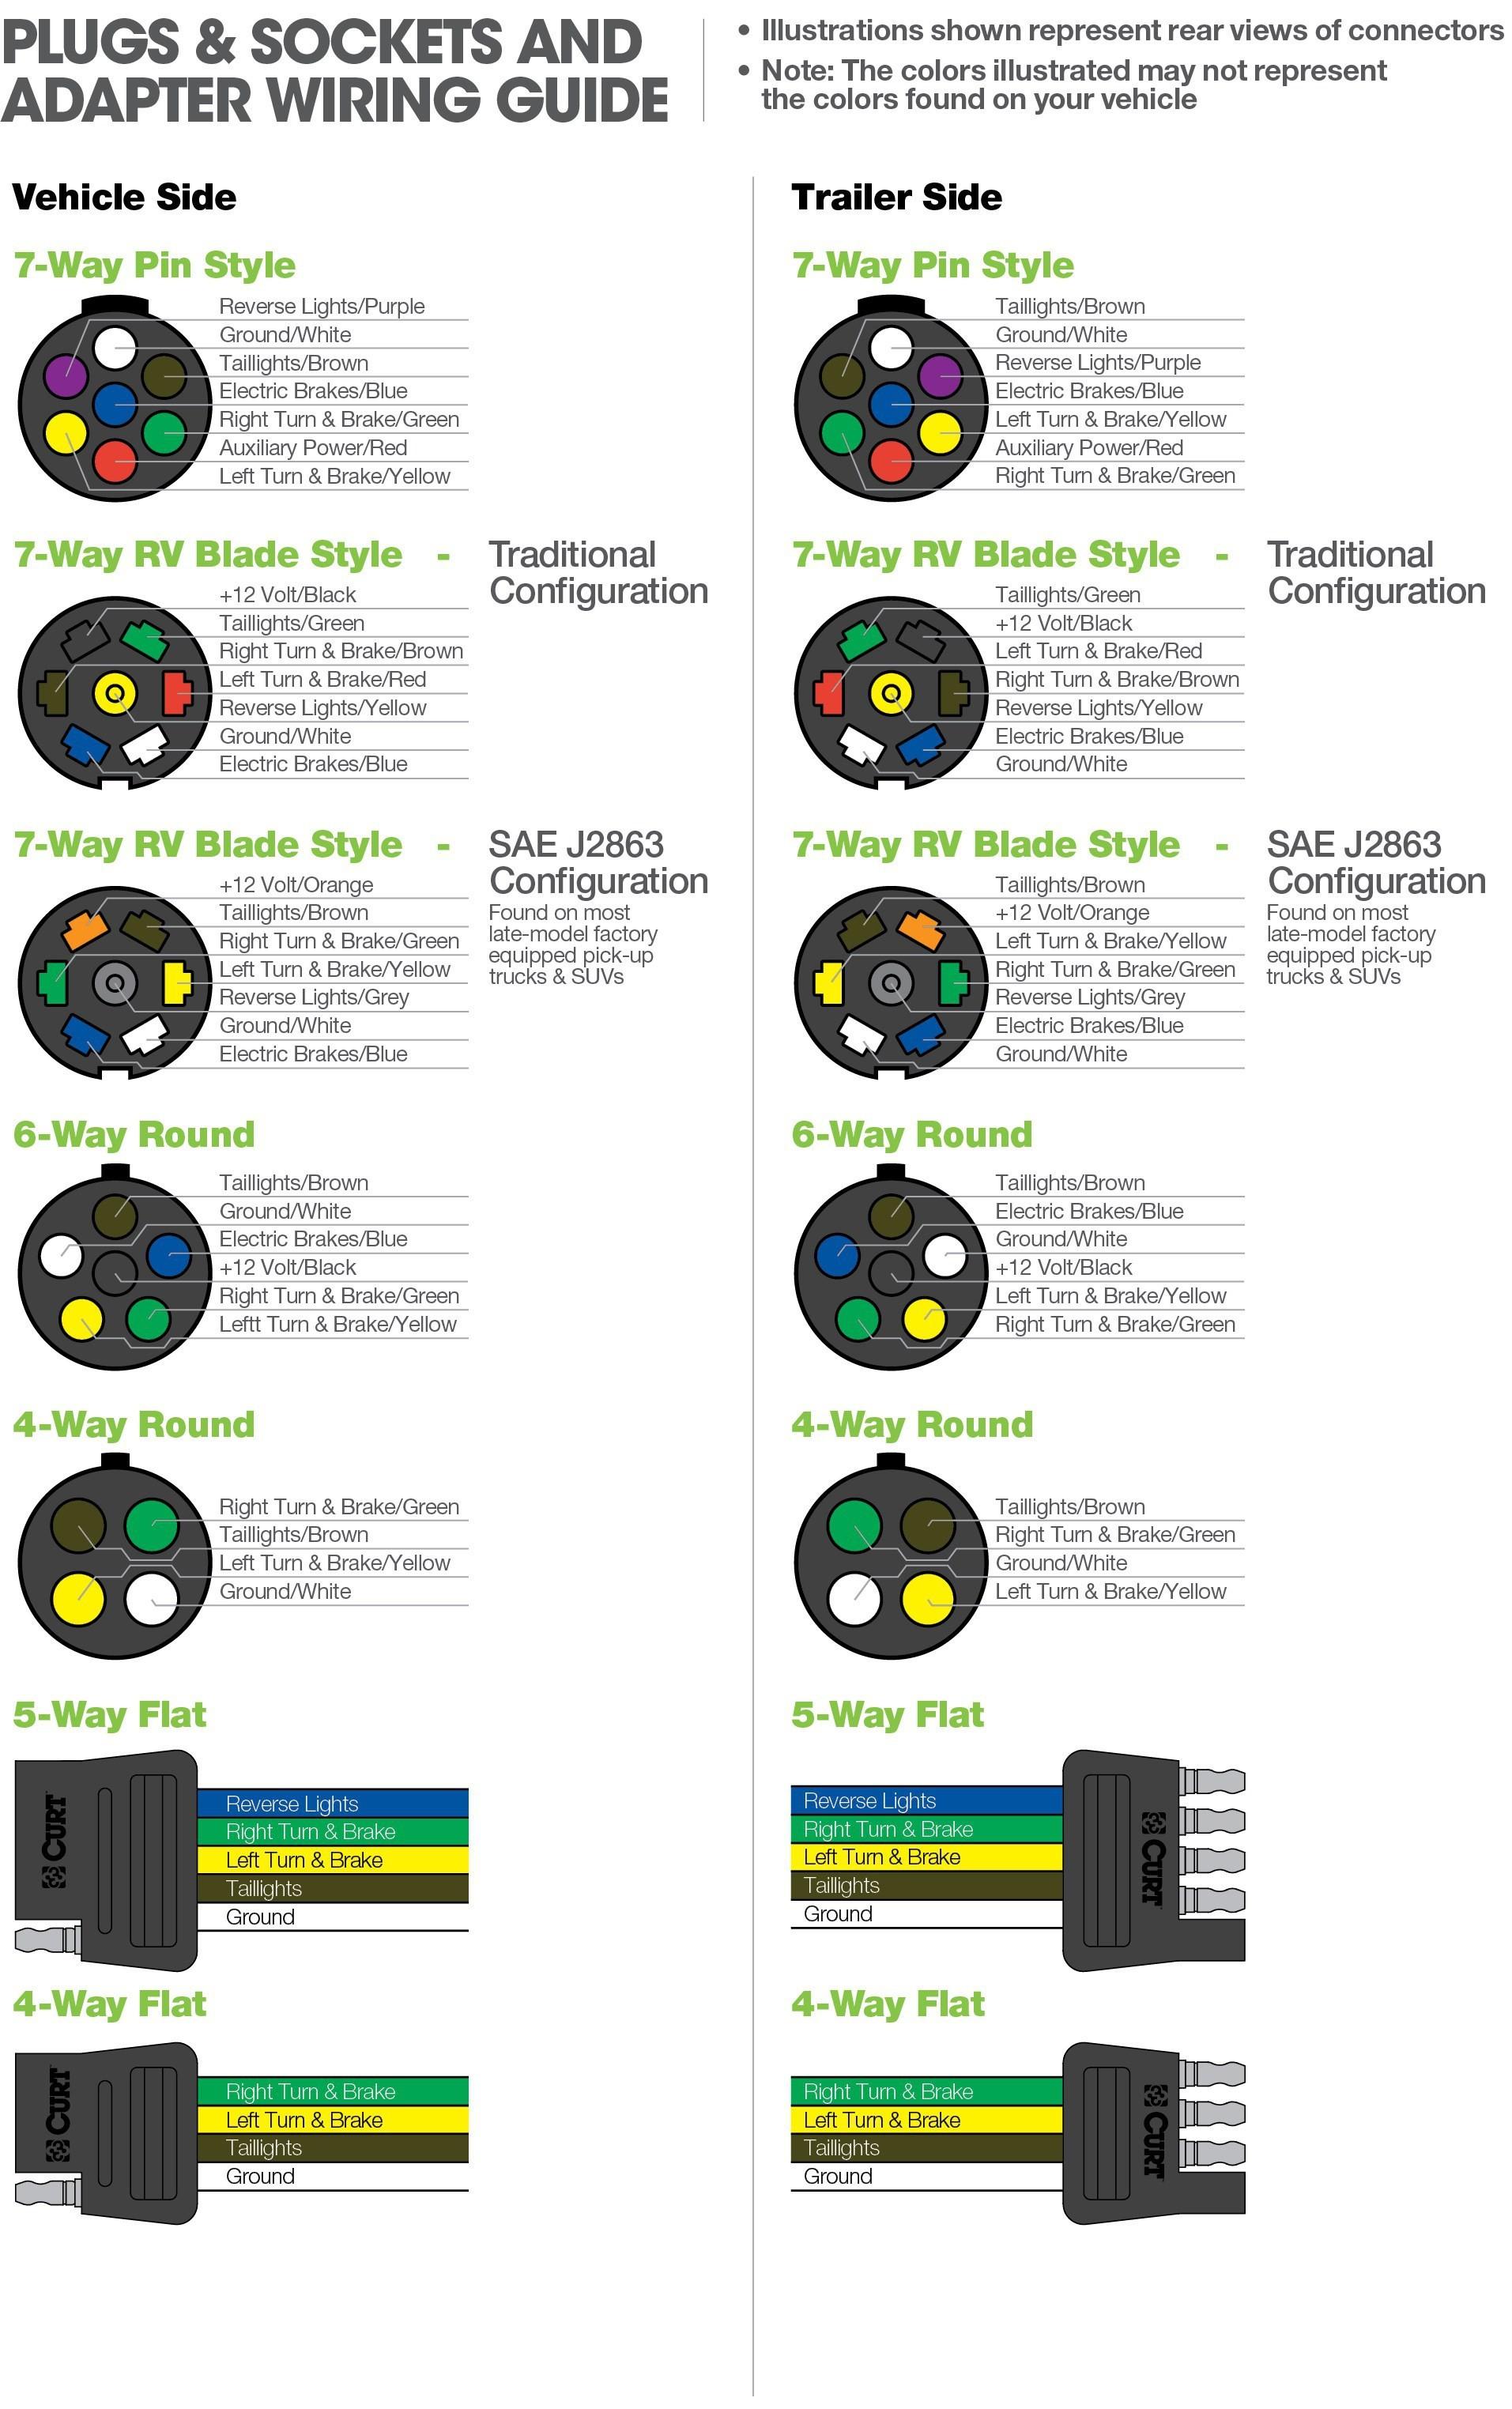 xm_0336] reese trailer wiring diagram download diagram  eumqu embo vish ungo sapebe mohammedshrine librar wiring 101